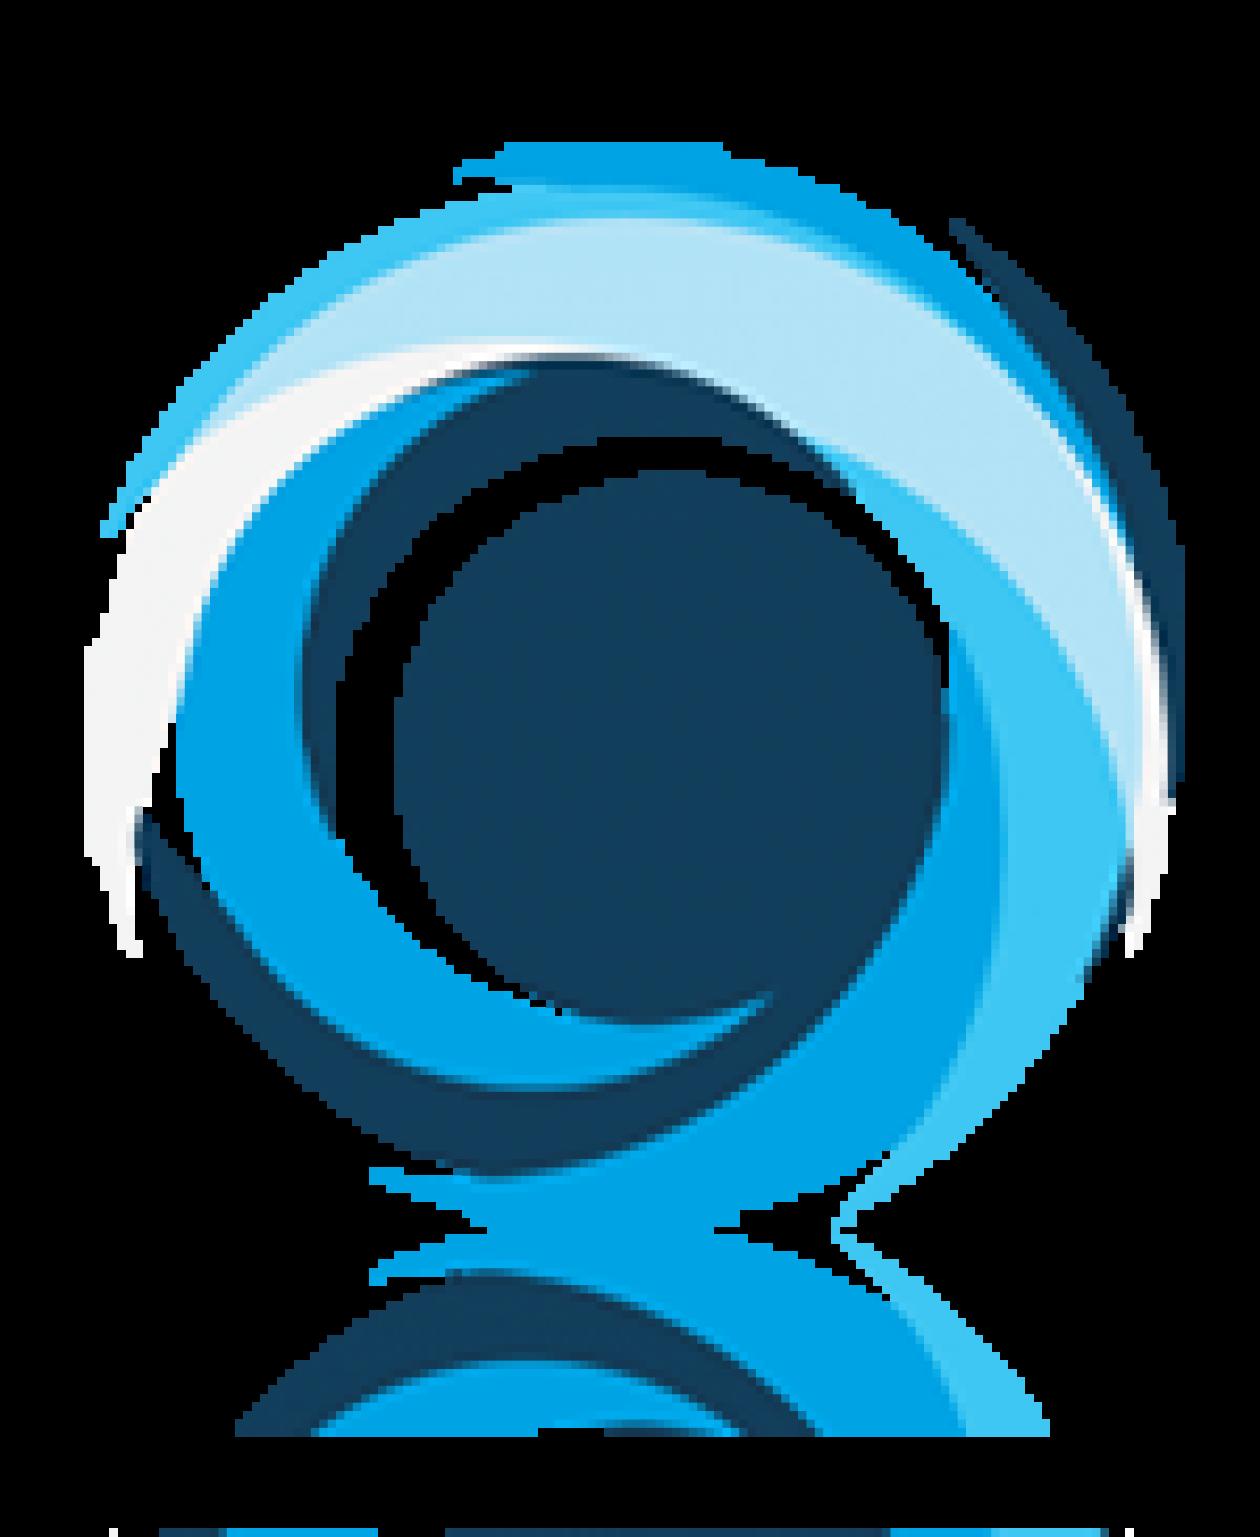 the planet logo